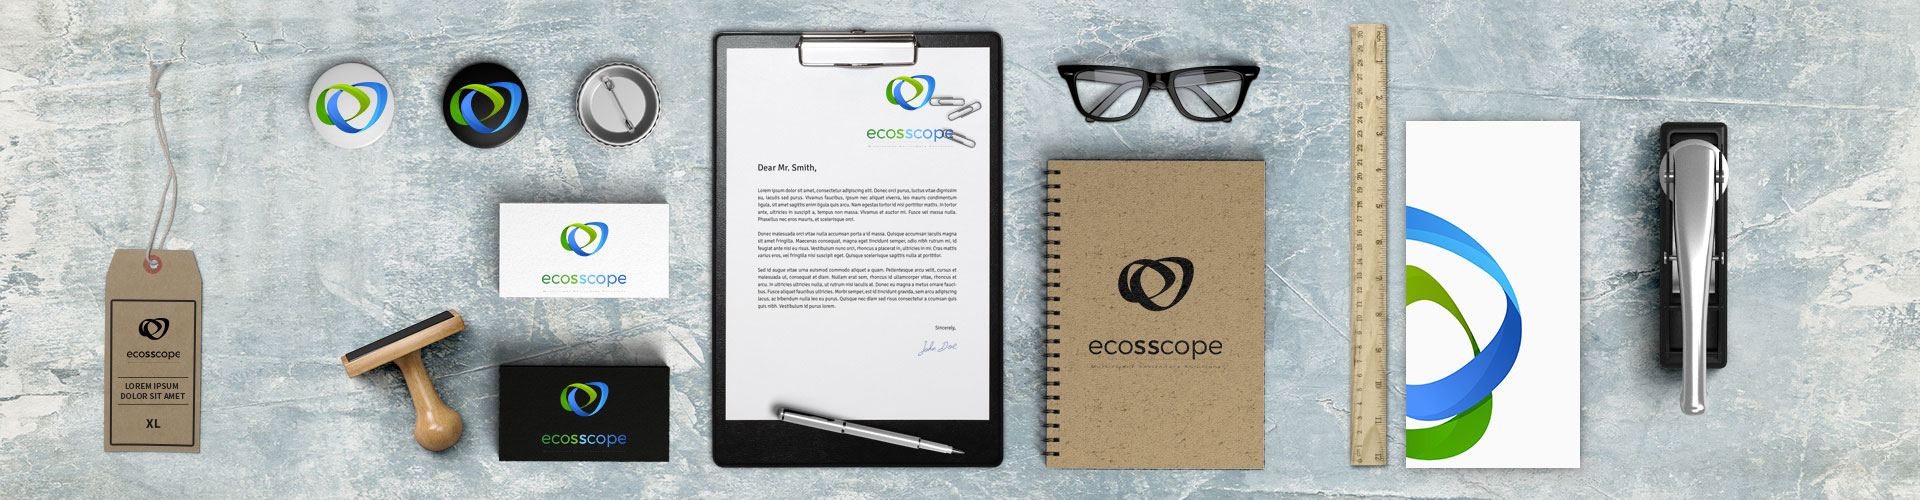 ecosscope-banner